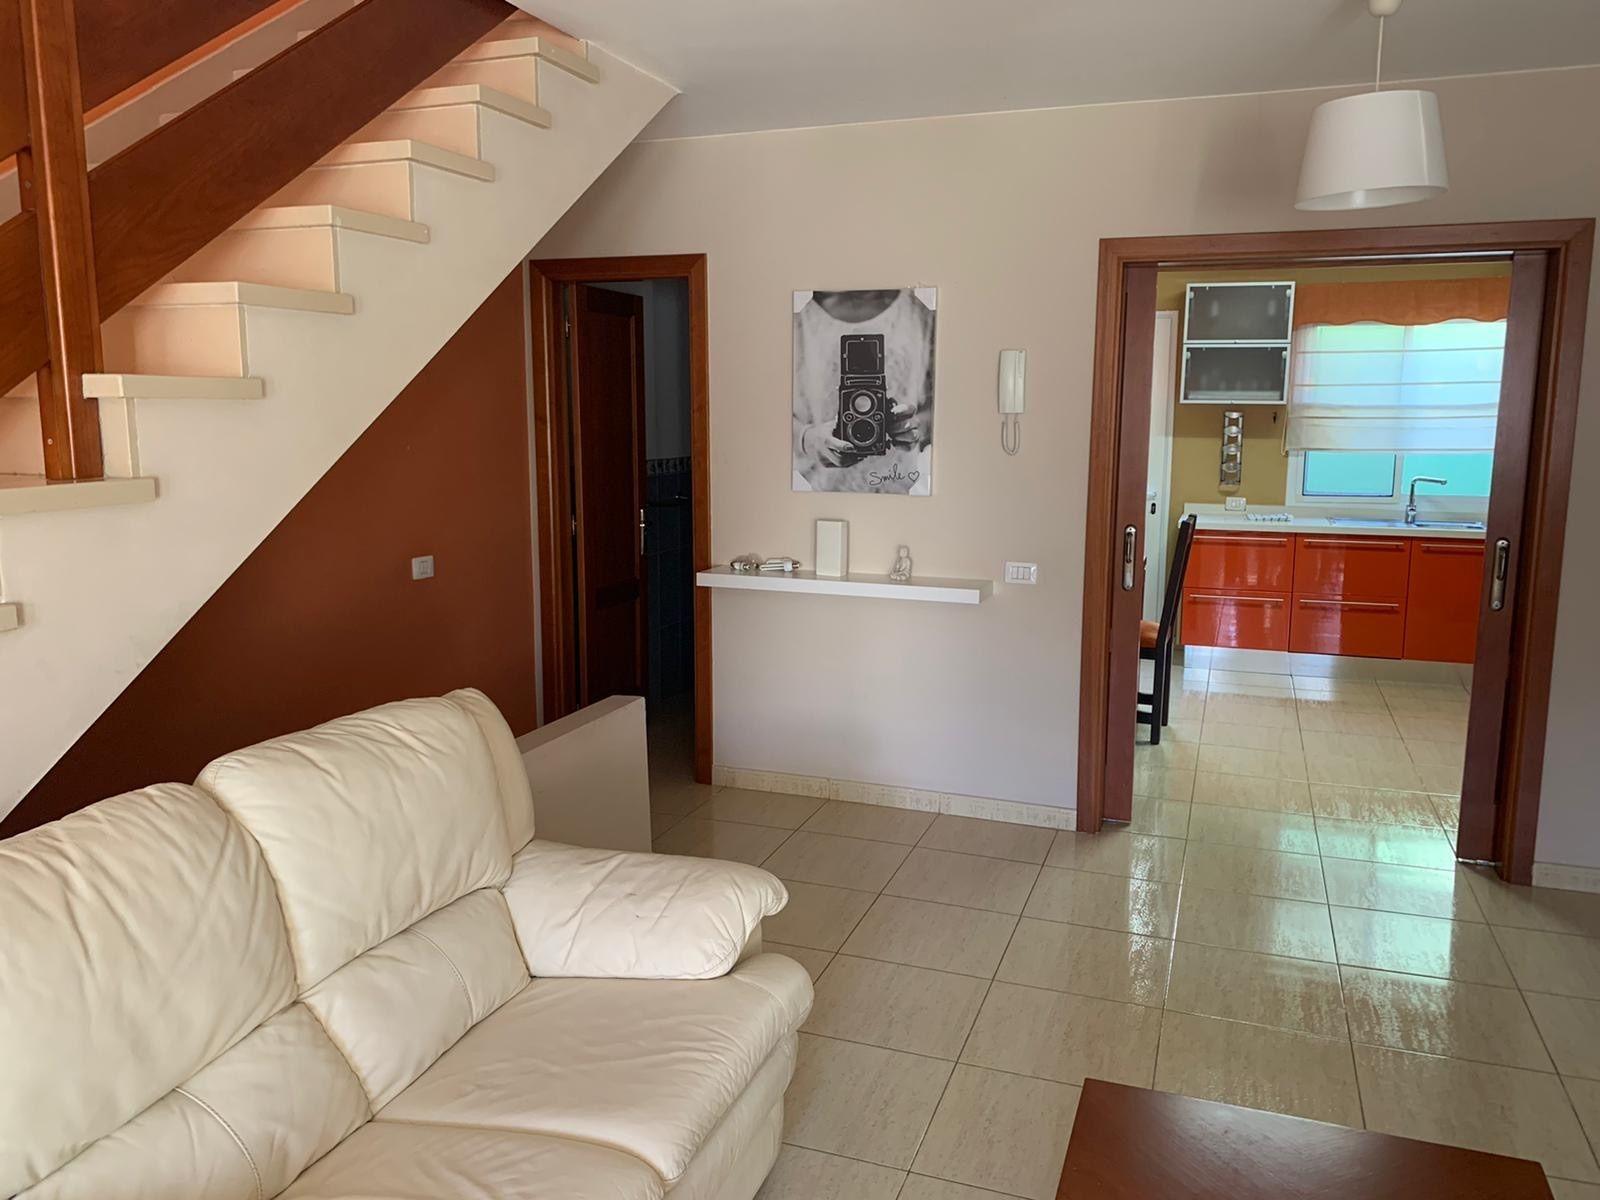 Duplex in Santa Lucía de Tirajana, Vecindario, for sale